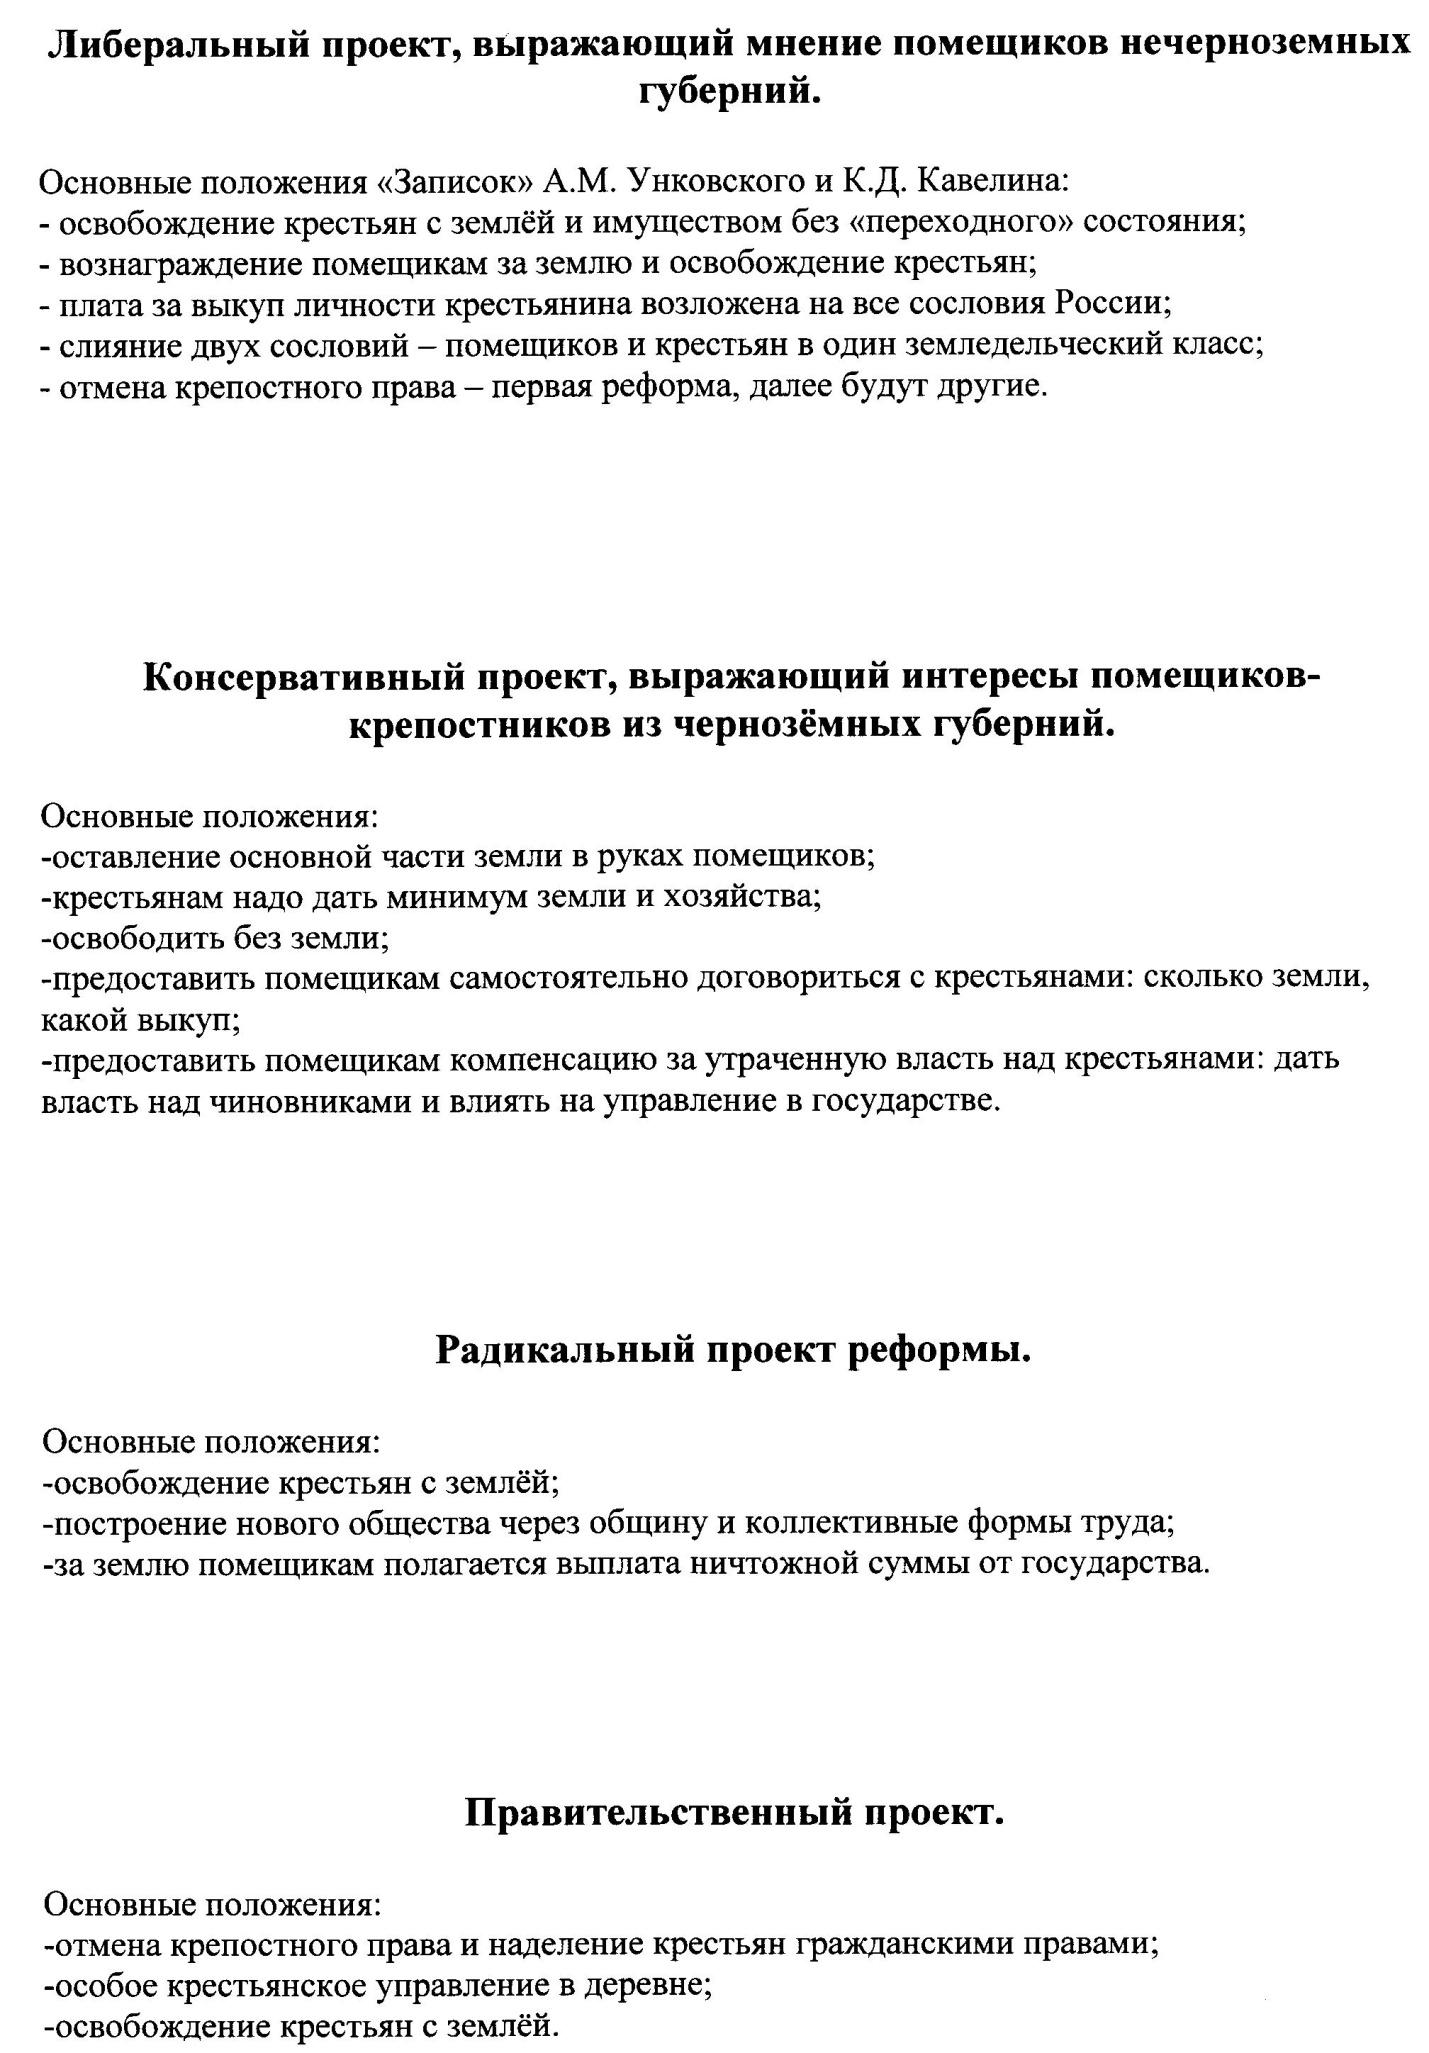 G:\Аттестация 2013\Пректы отмены крепостного права.jpg